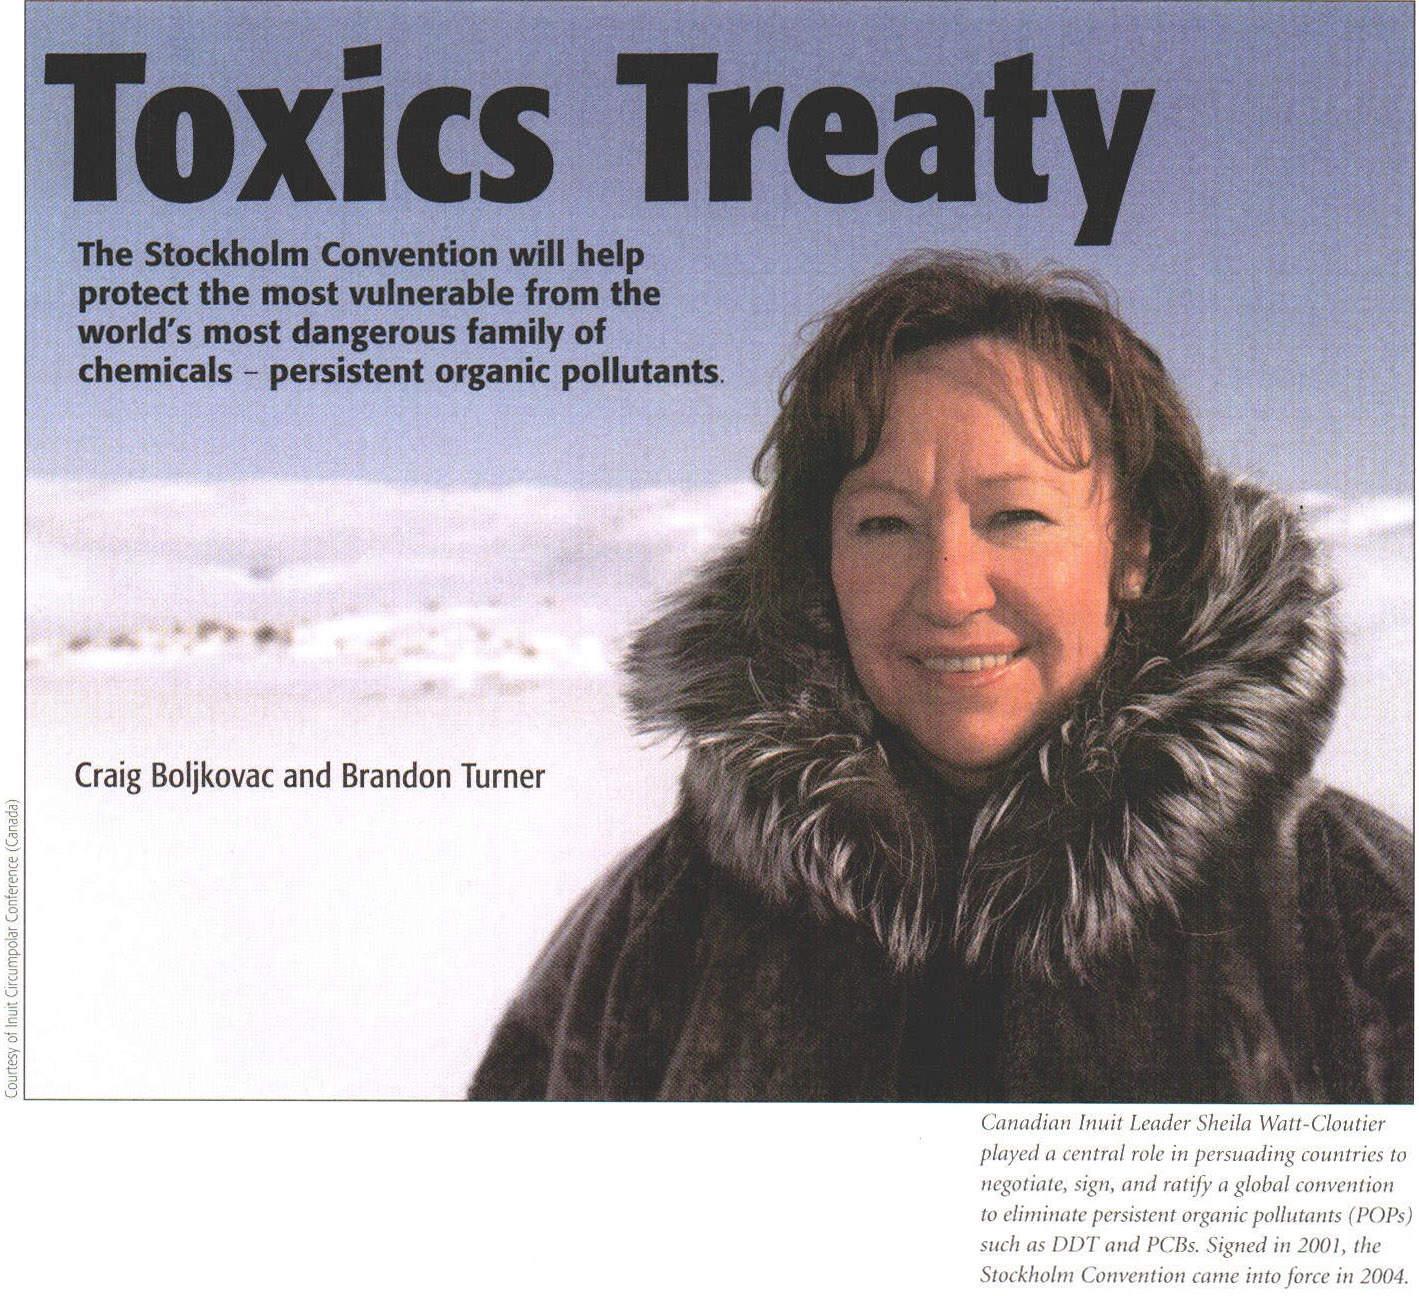 Gale Academic OneFile - Document - Toxics treaty: the